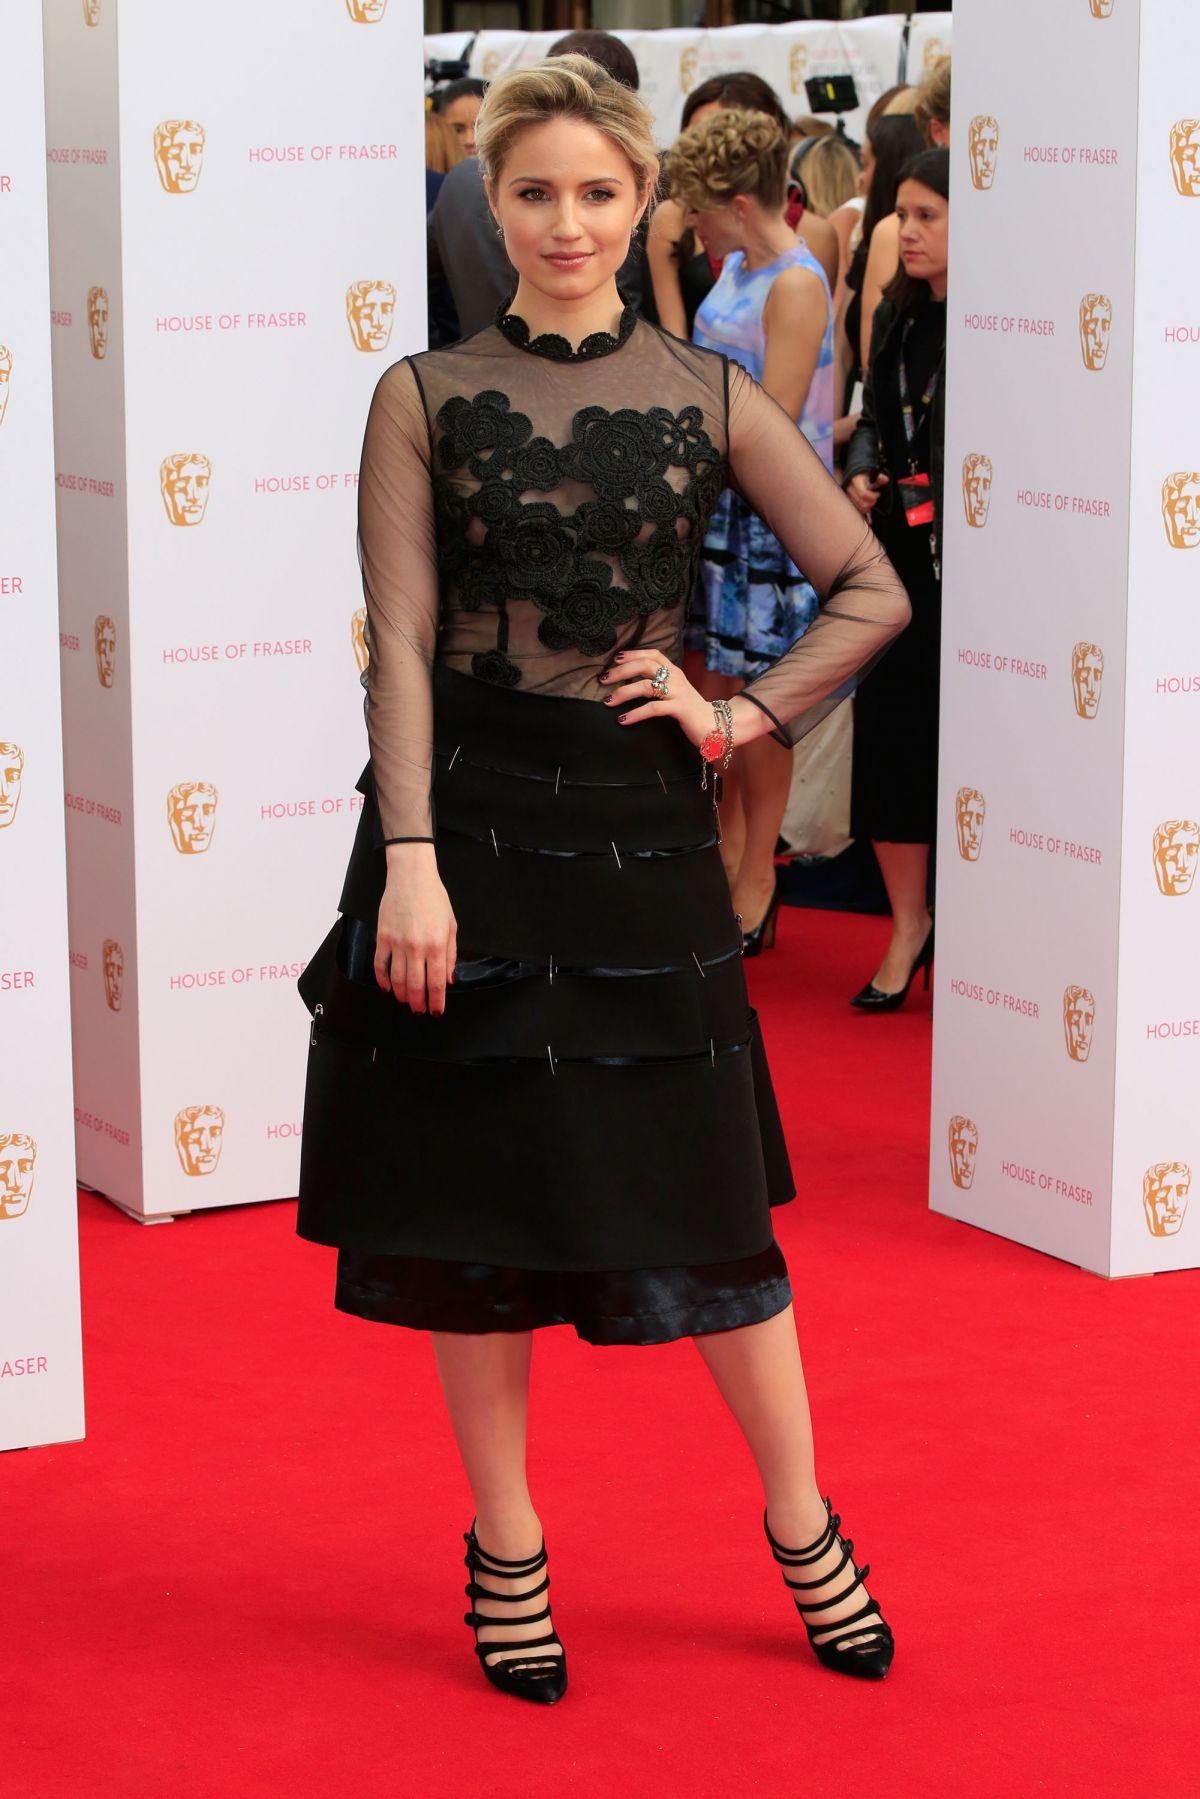 DIANNA AGRON at BAFTA 2015 Awards in London